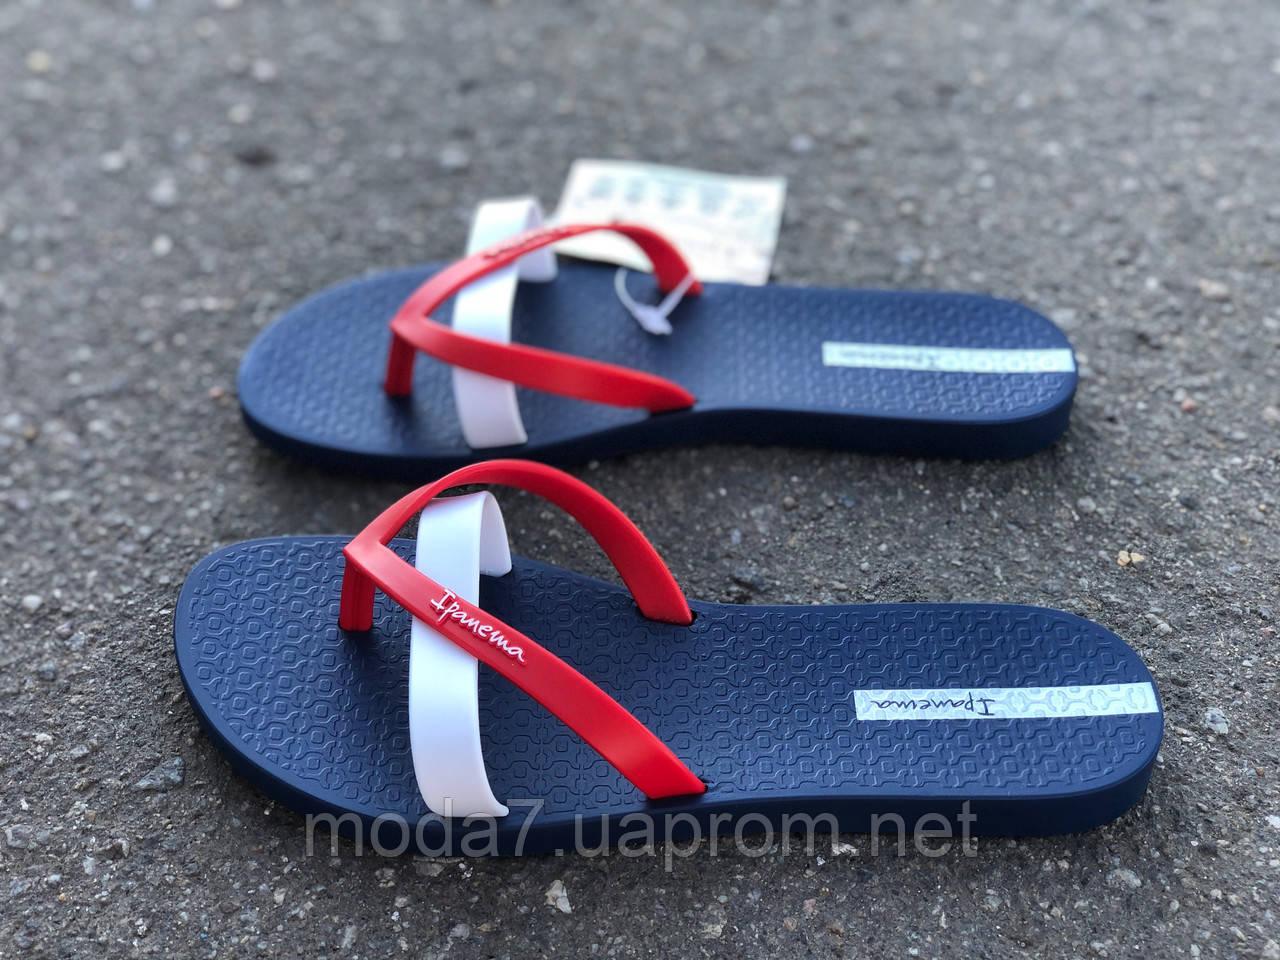 Вьетнамки женские IPANEMA Kirei Fem 81805 Blue/Red/White